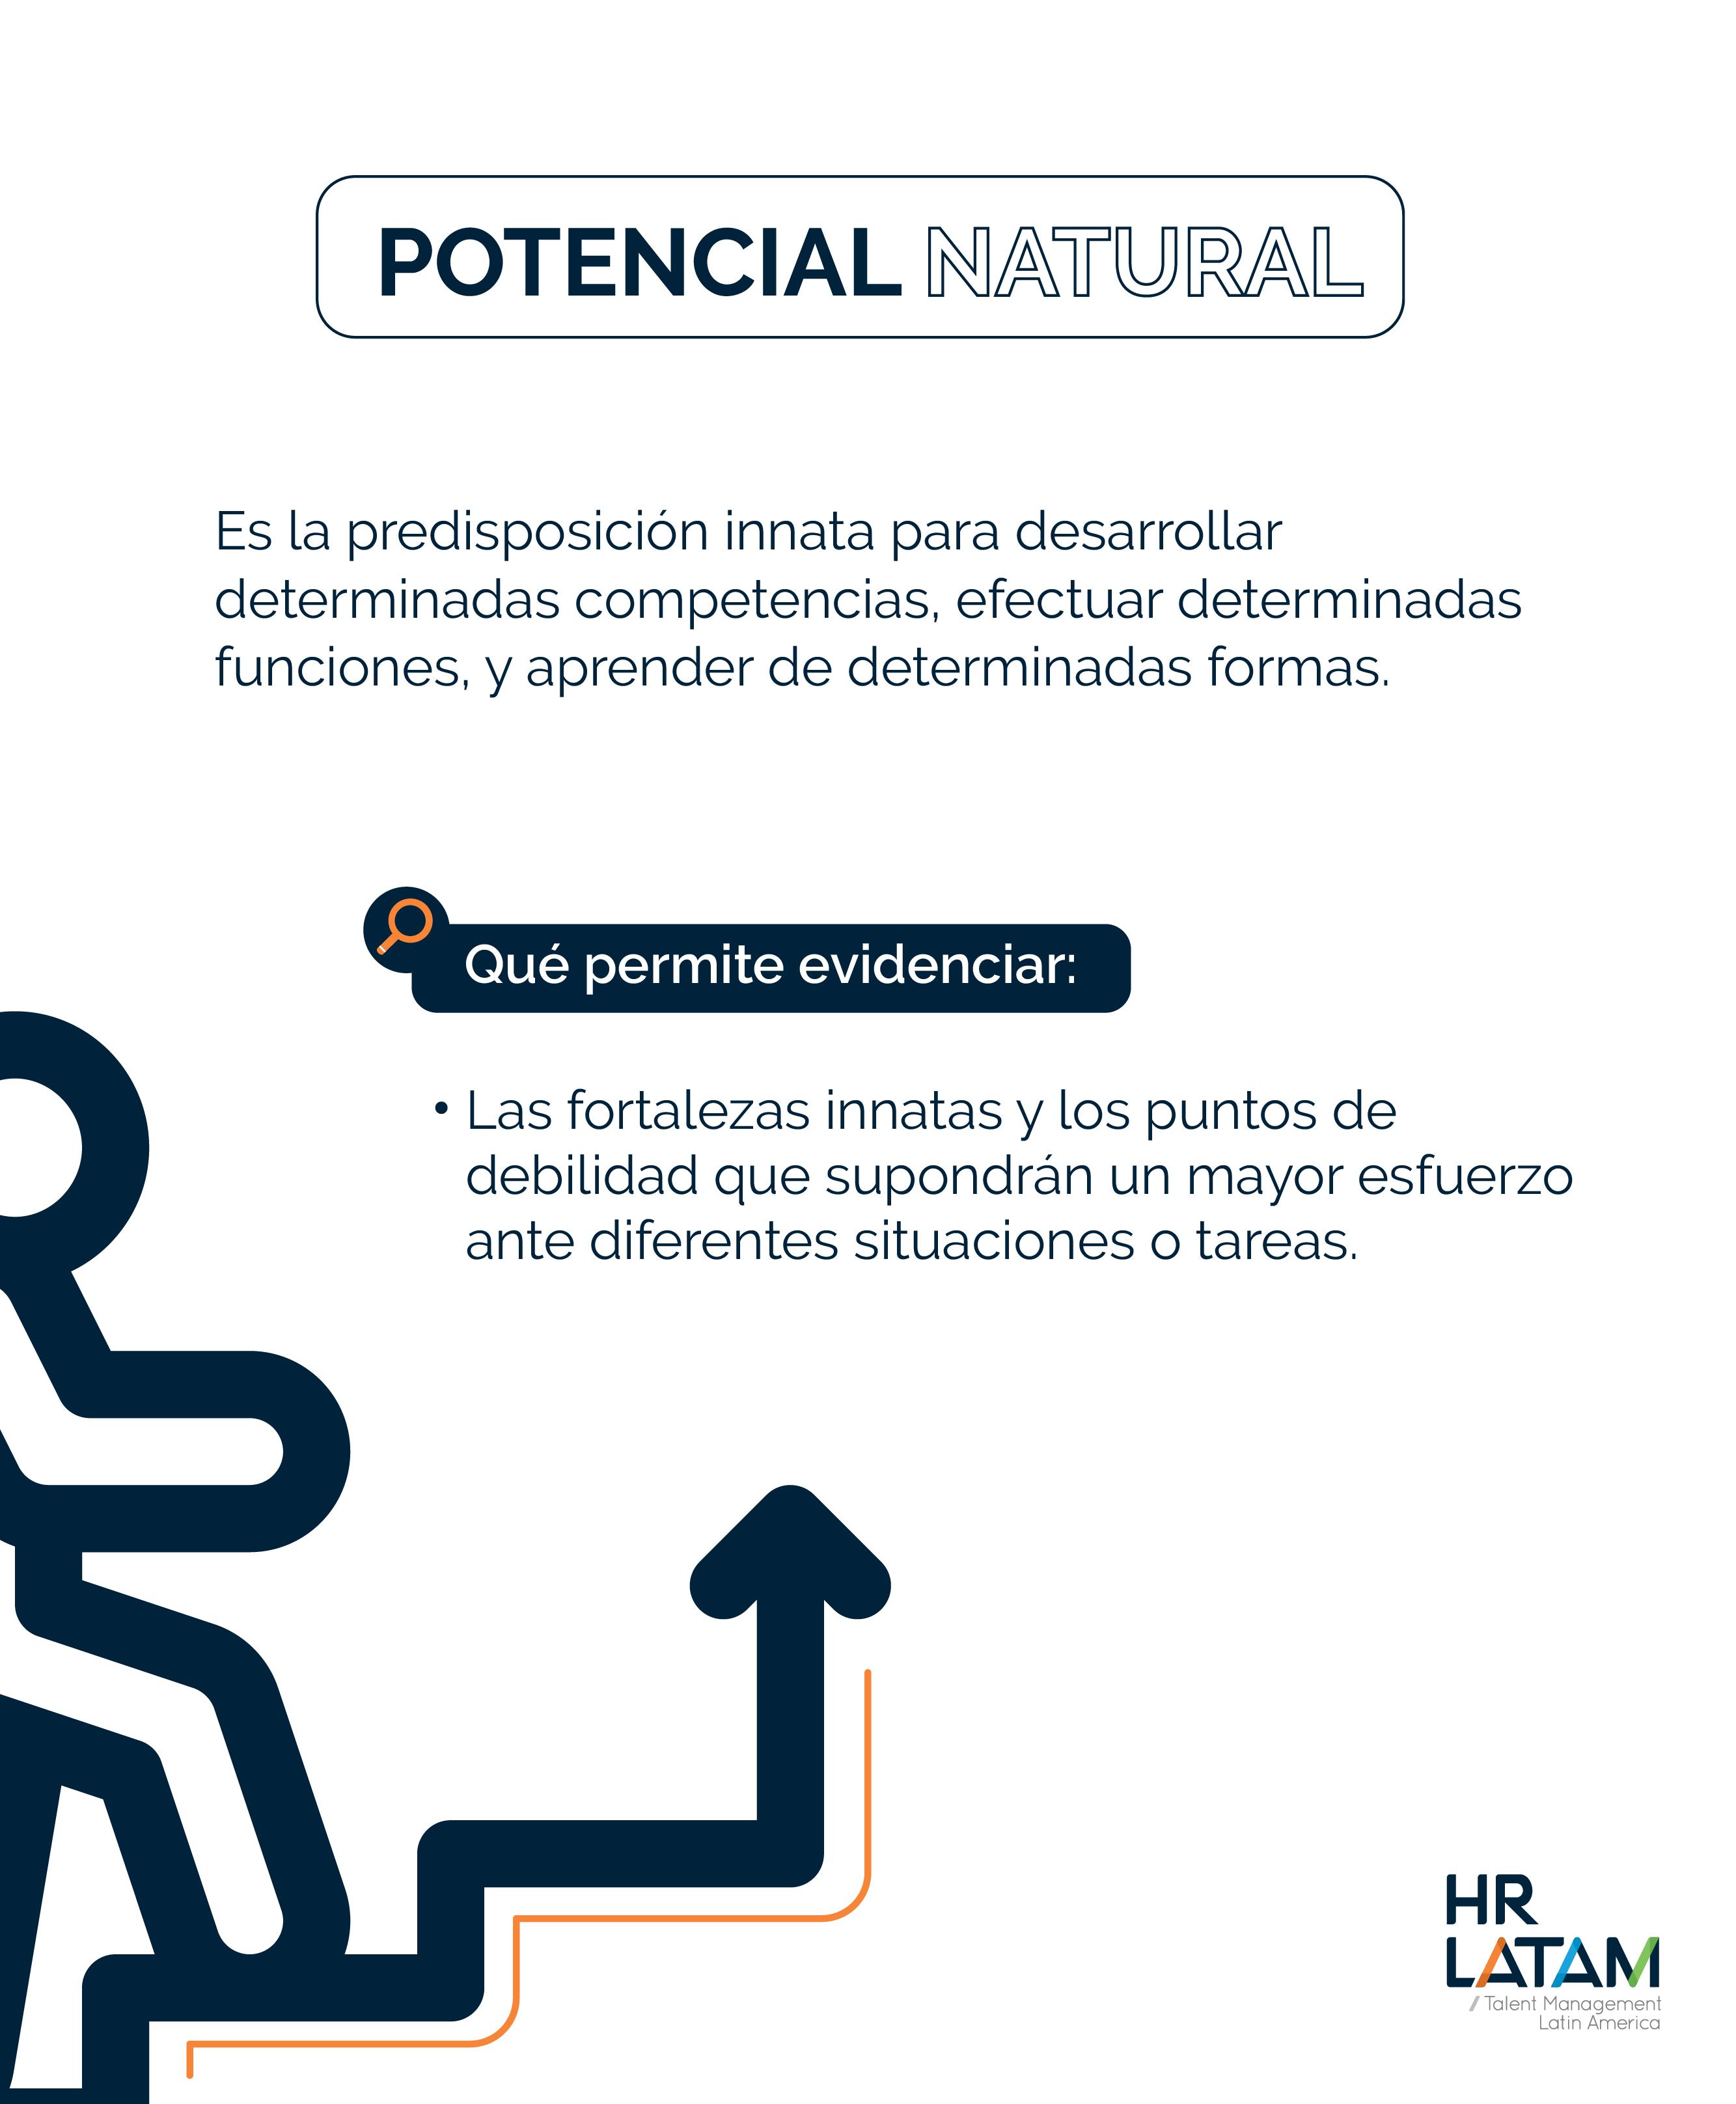 Potencial natural del potencial humano